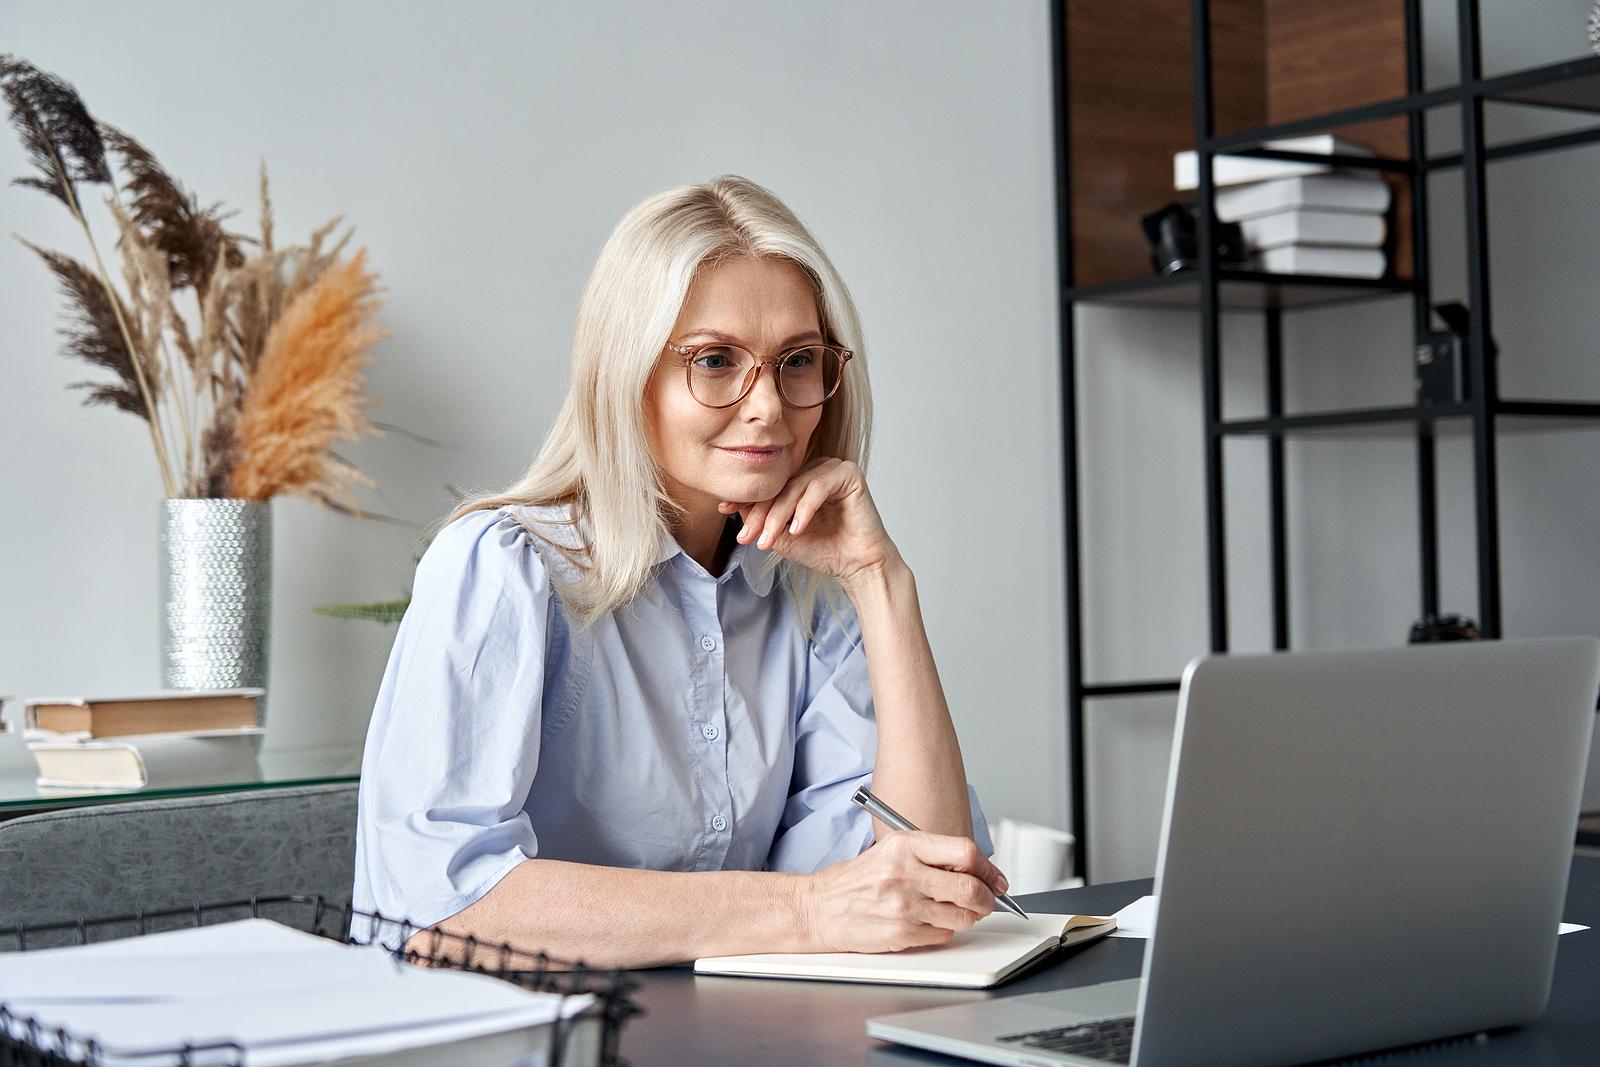 Understanding the Benefits of Online Learning vs Onsite